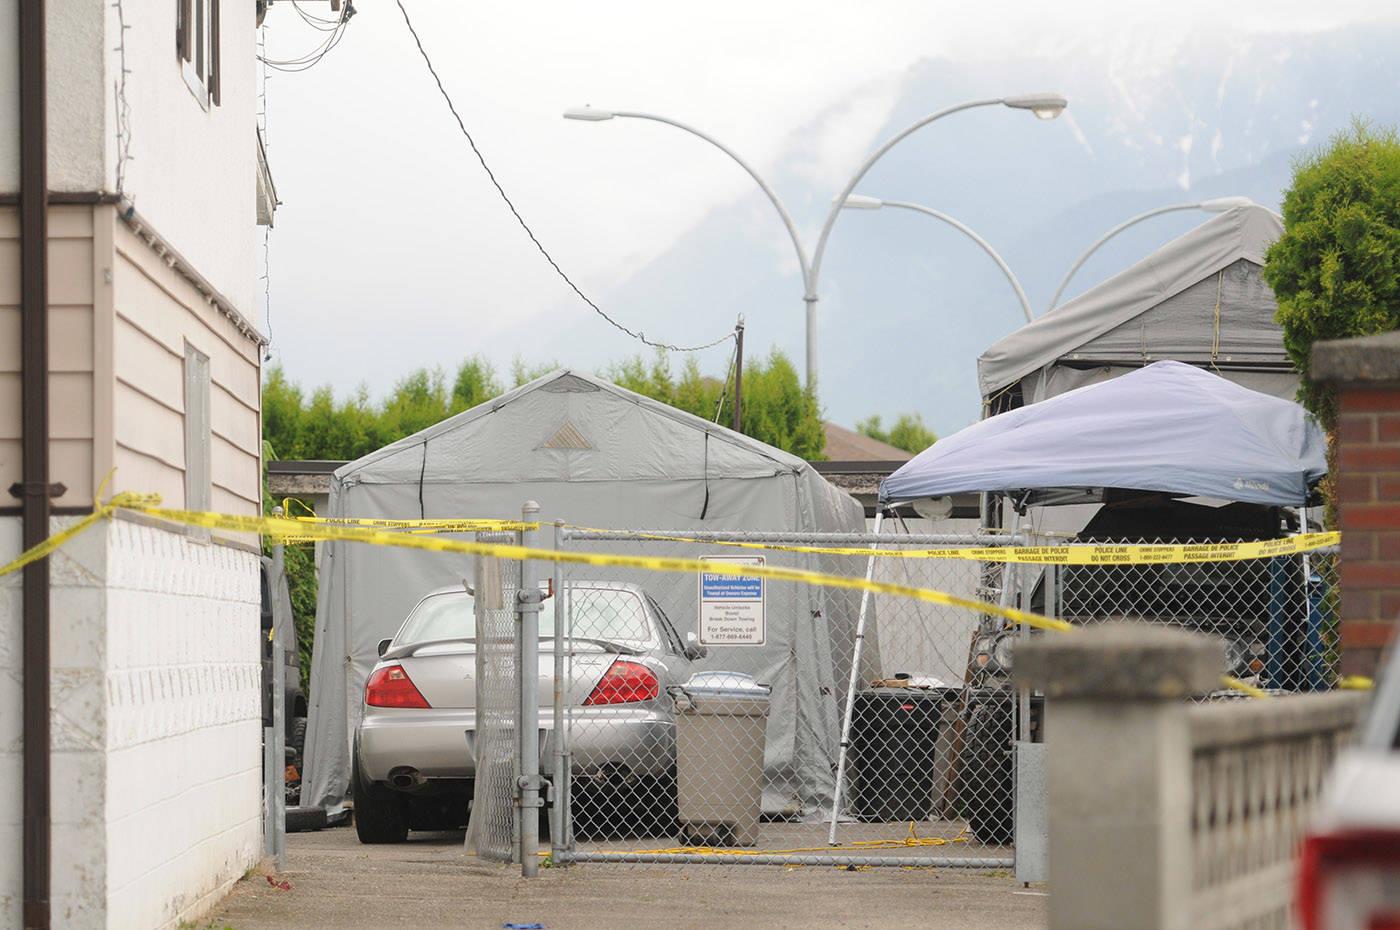 RCMP were on scene at a house on Broadway street on Thursday, May 27, 2021. (Jenna Hauck/ Chilliwack Progress)